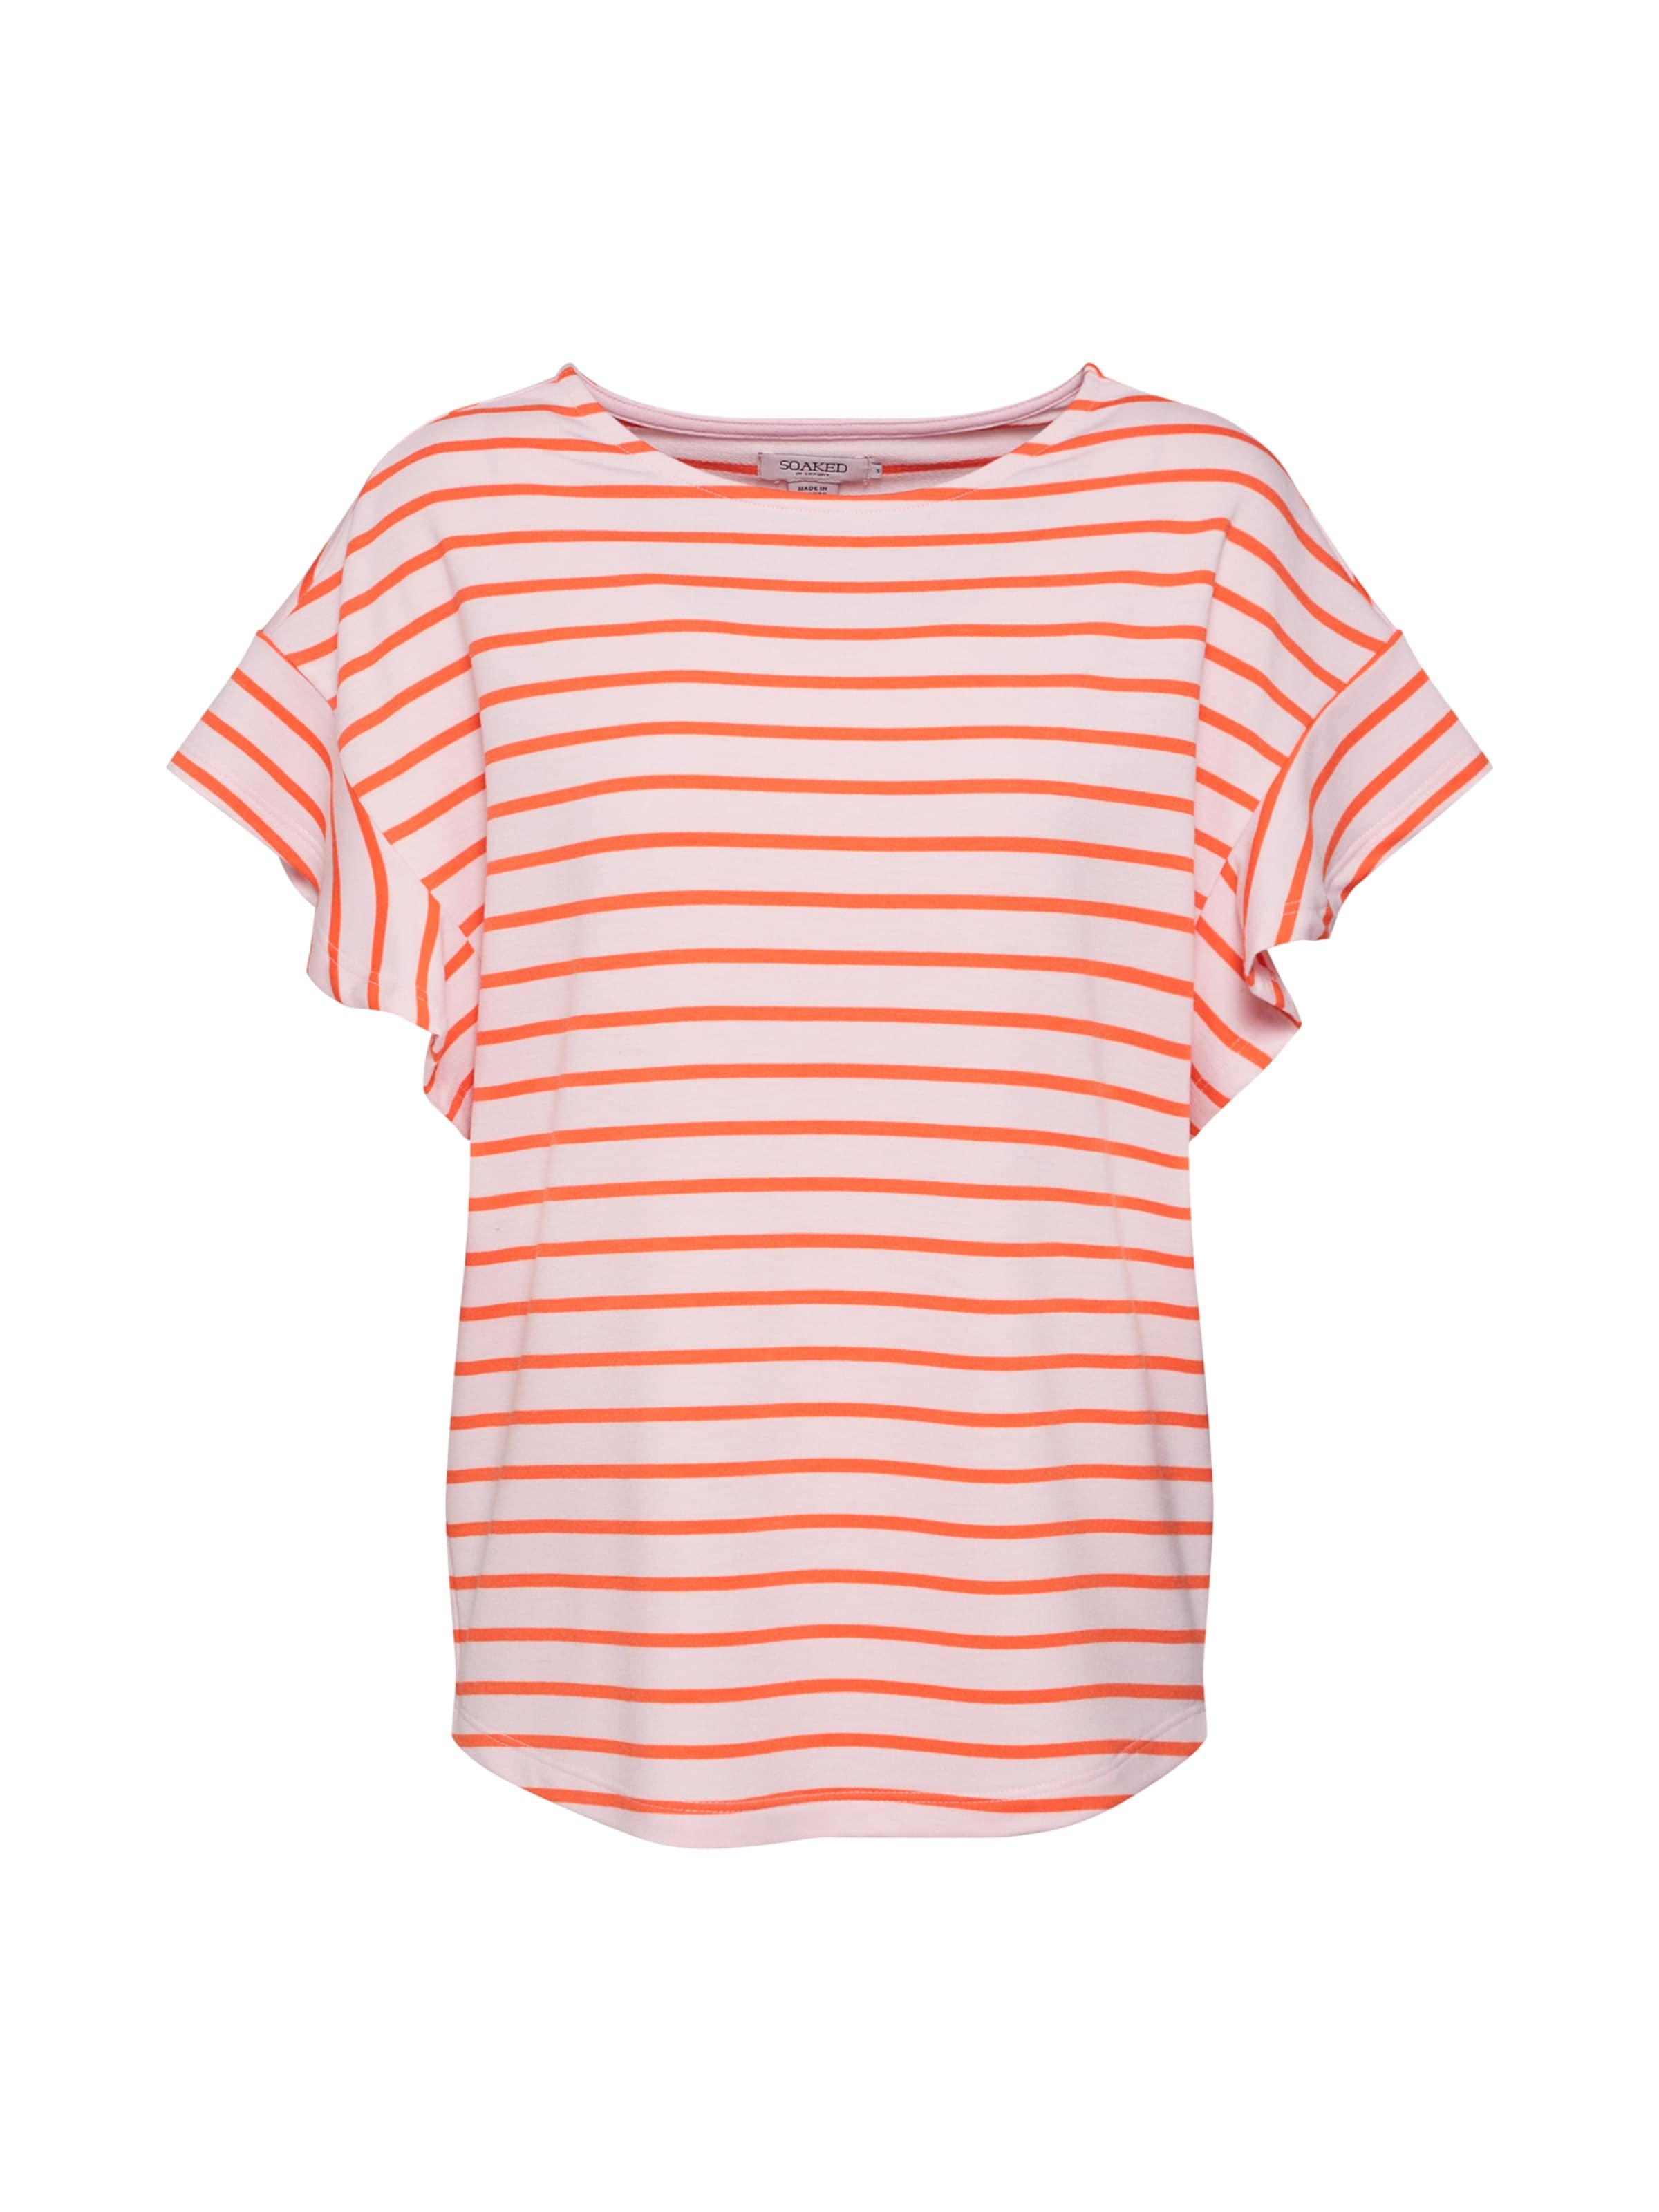 CremePfirsich Soaked In 'bernadine' Luxury Shirt 5SAj3Lqc4R